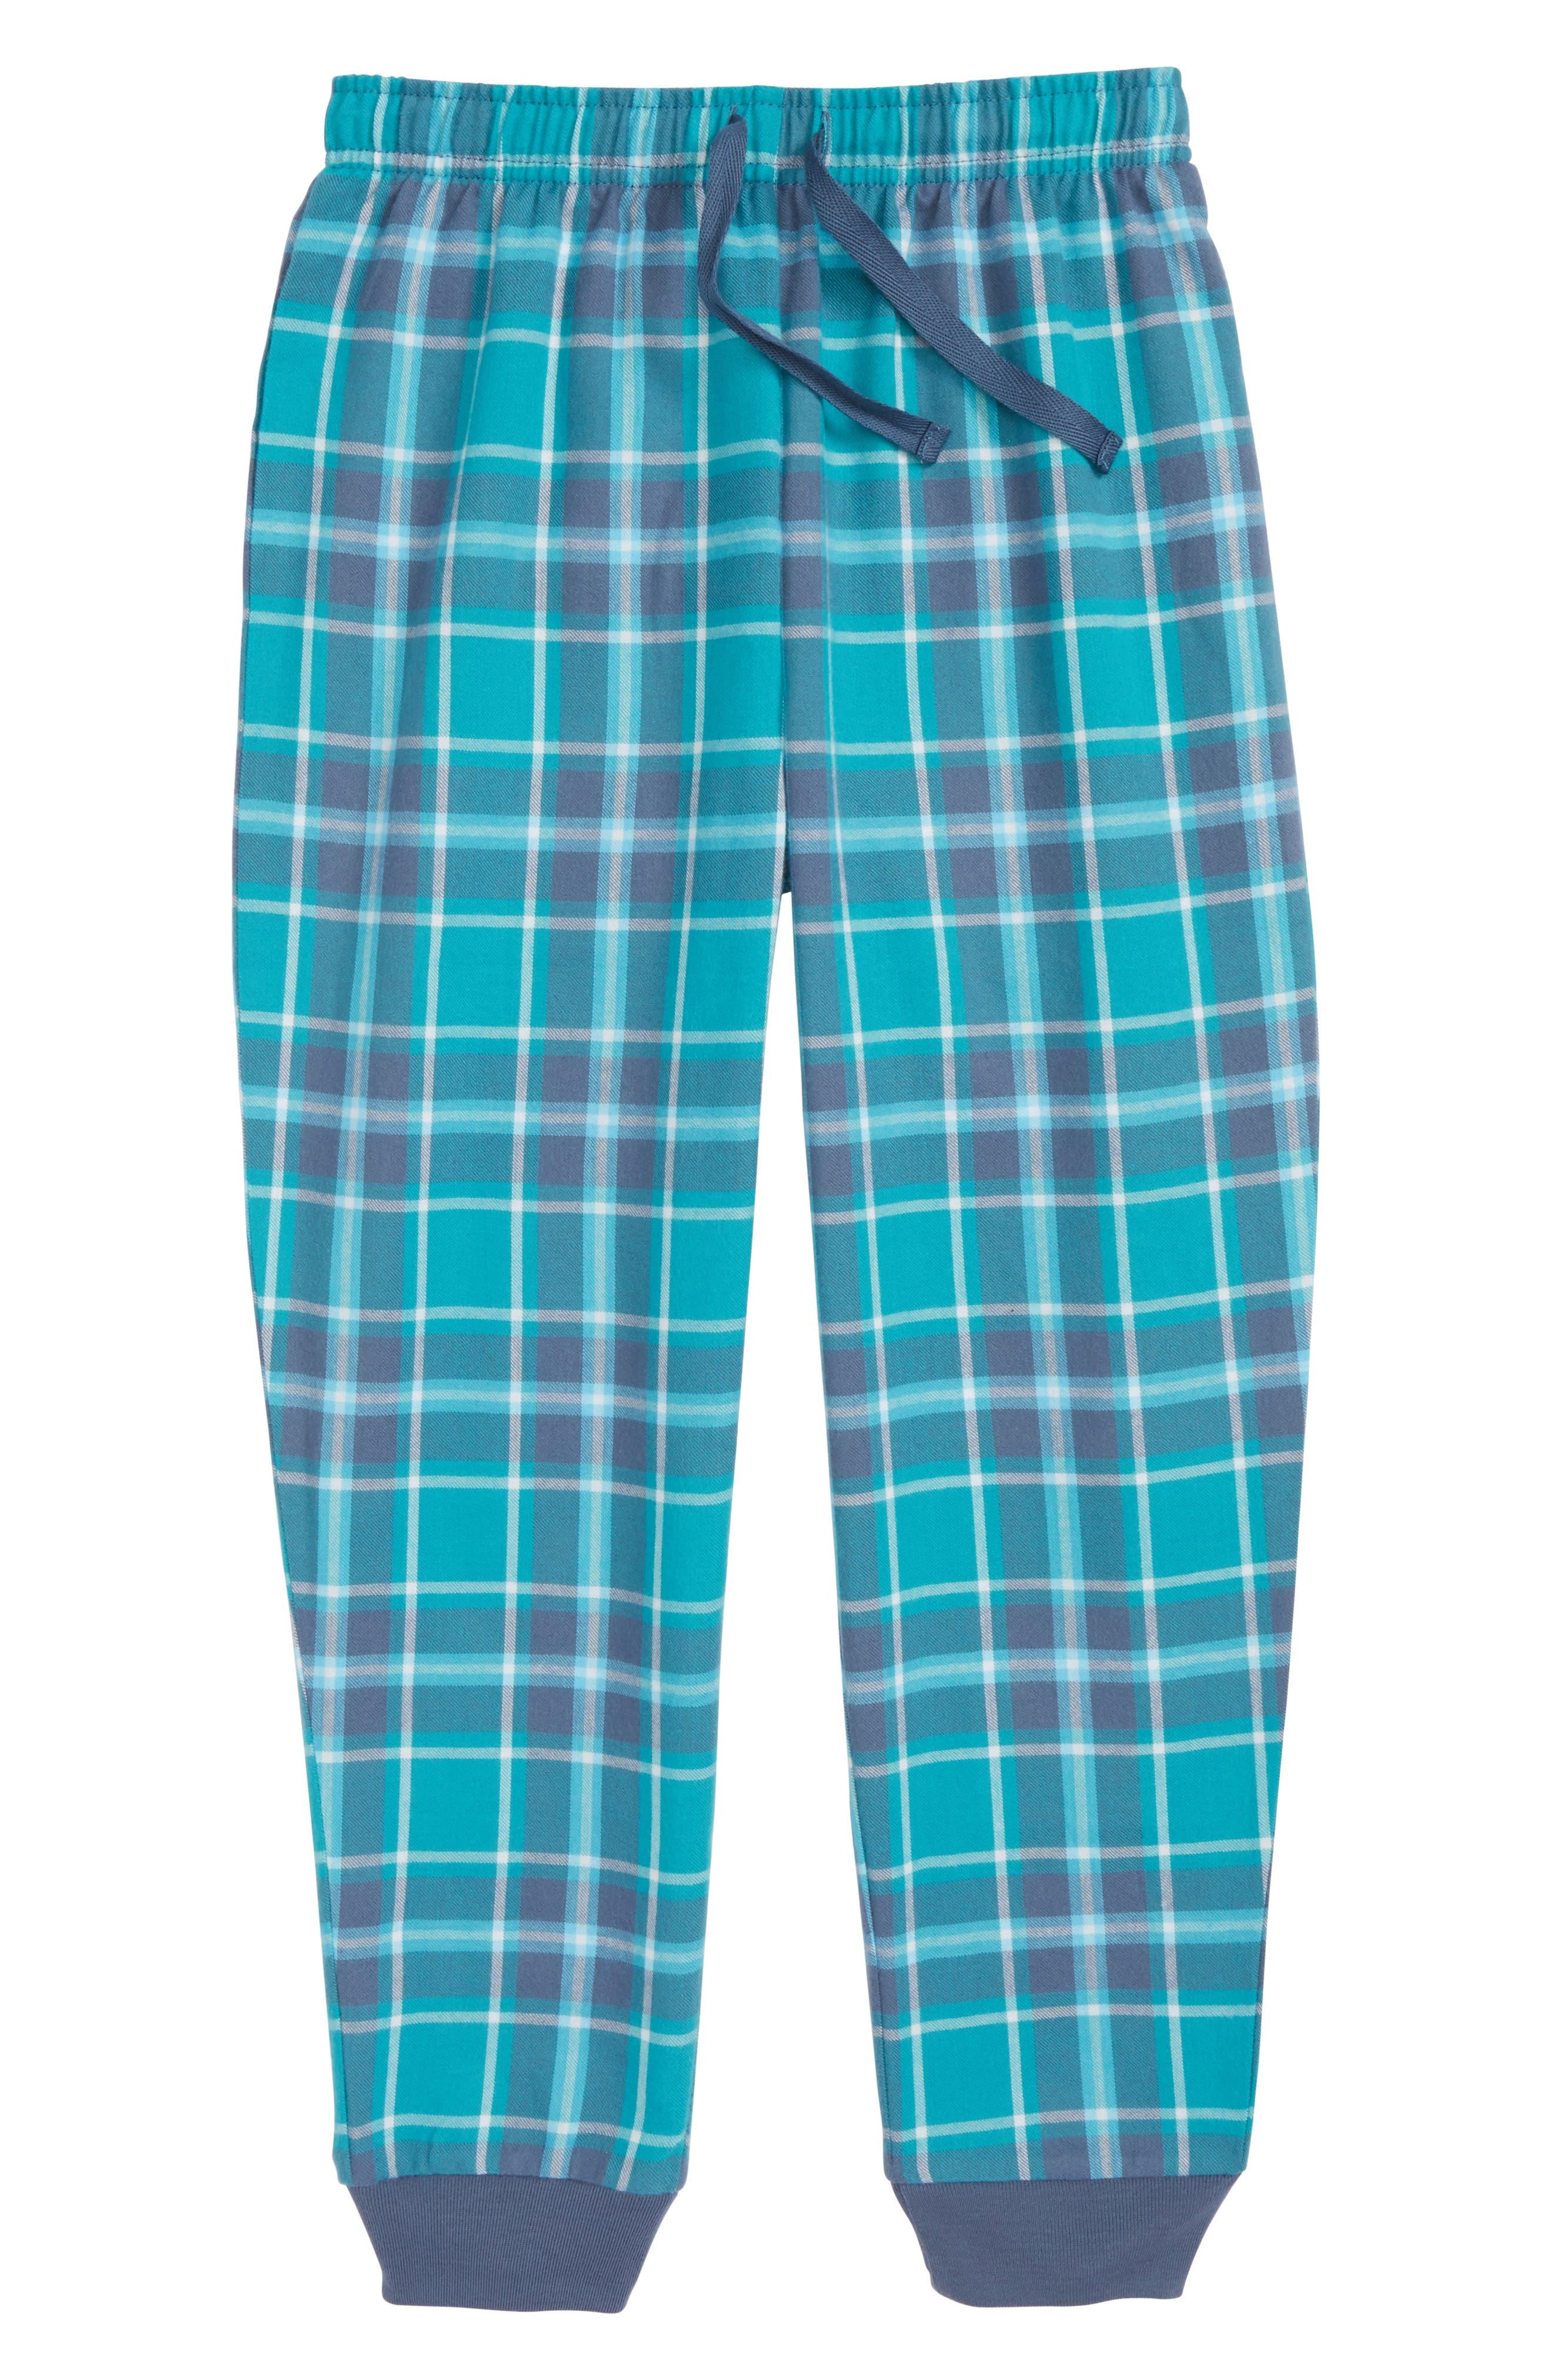 Flannel Jogger Pants,                         Main,                         color, NAVY PEACOAT PLAID